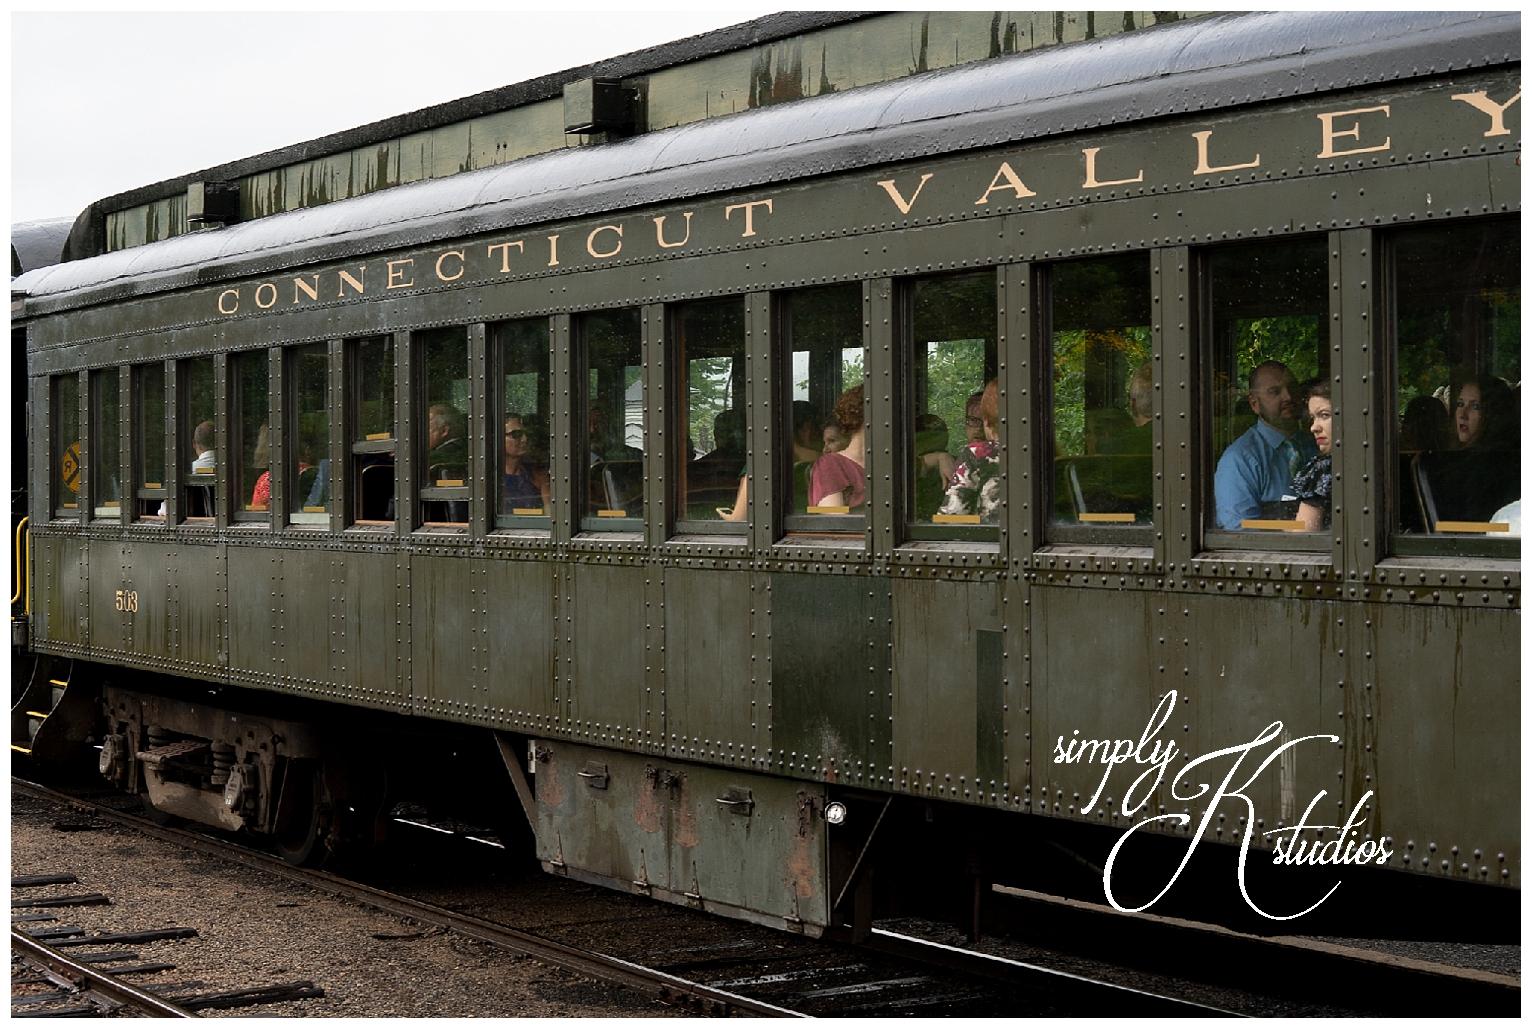 The Essex Steam Train Wedding Transportation.jpg